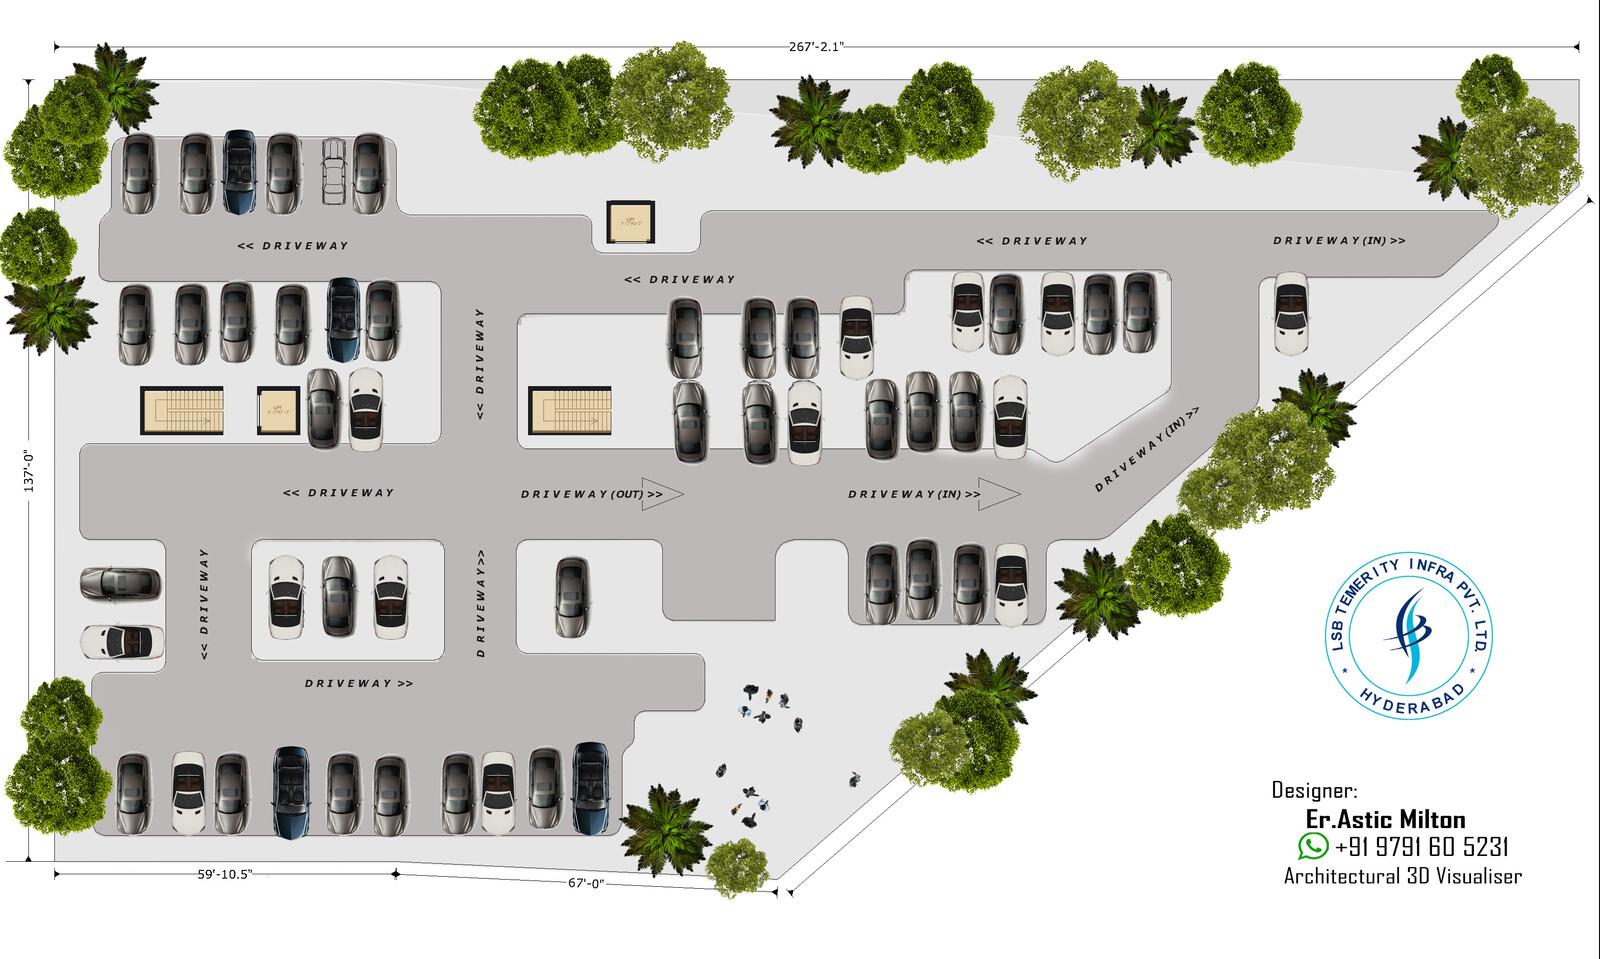 Artstation 2d Floor Plan Works For The Apartments Astic Milton